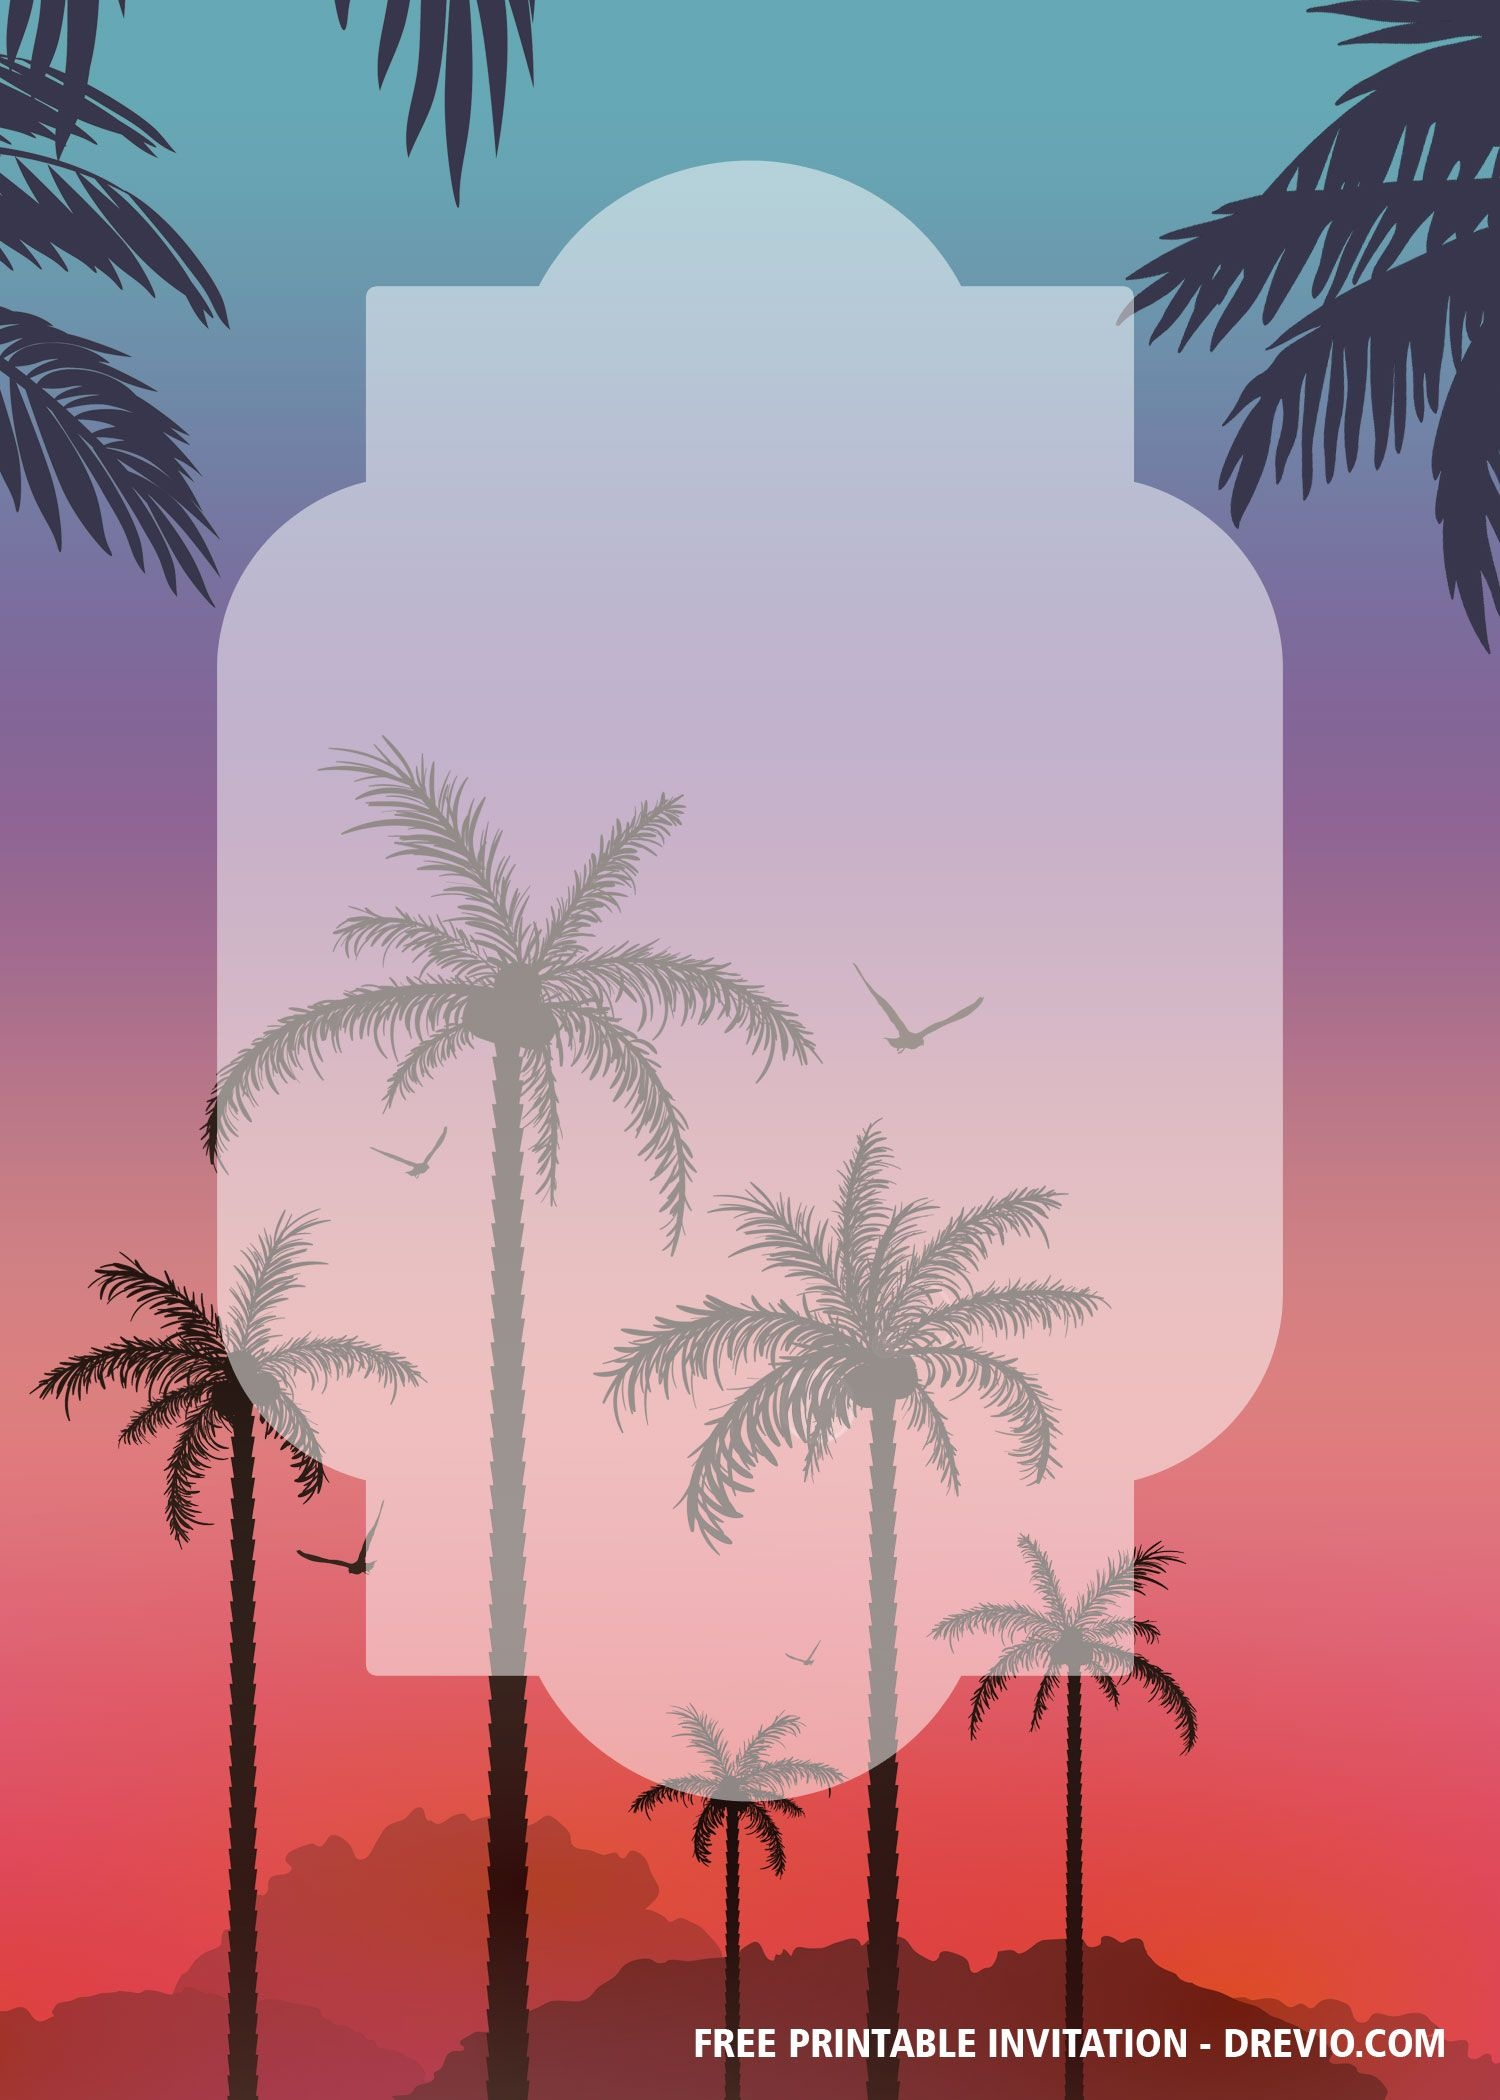 Free Printable Palm Tree Invitation Templates   Bagvania Invitation - Free Printable Palm Tree Template